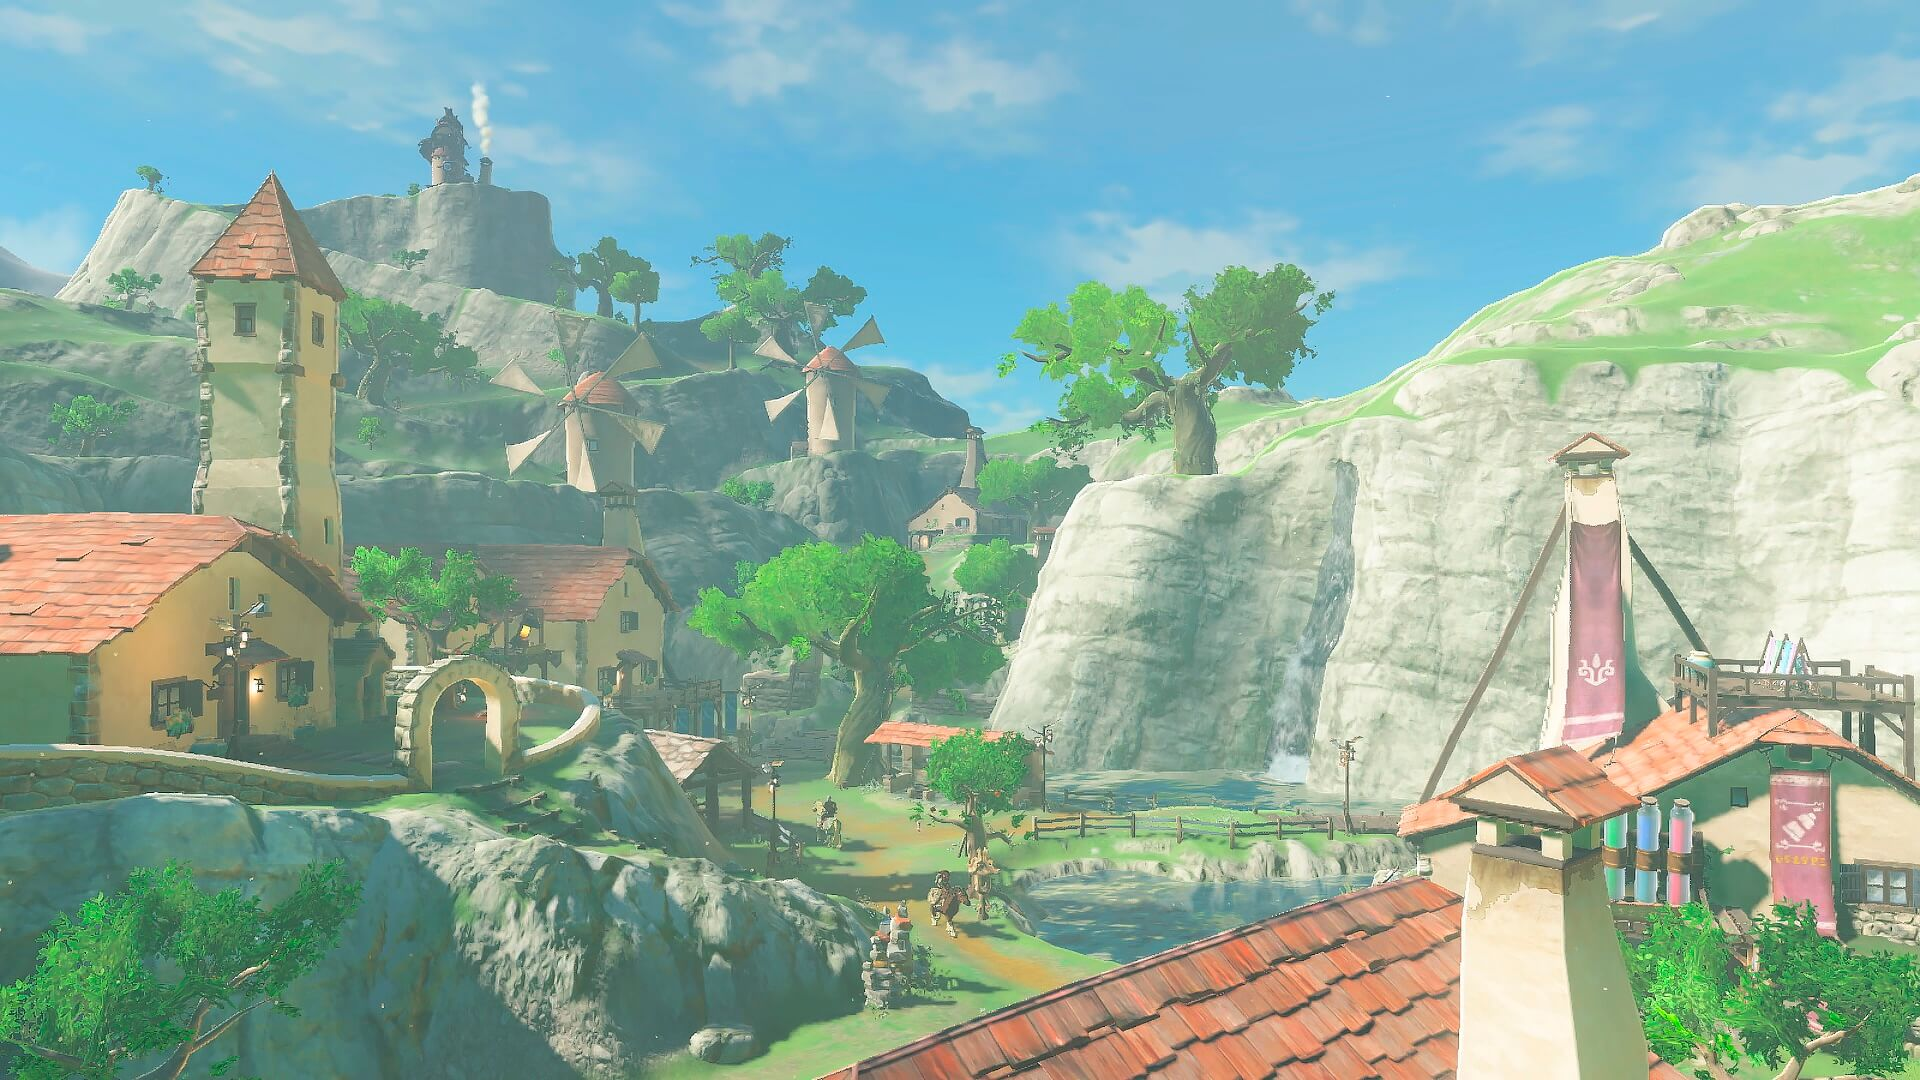 Скриншот из игры The Legend of Zelda: Breath of the Wild